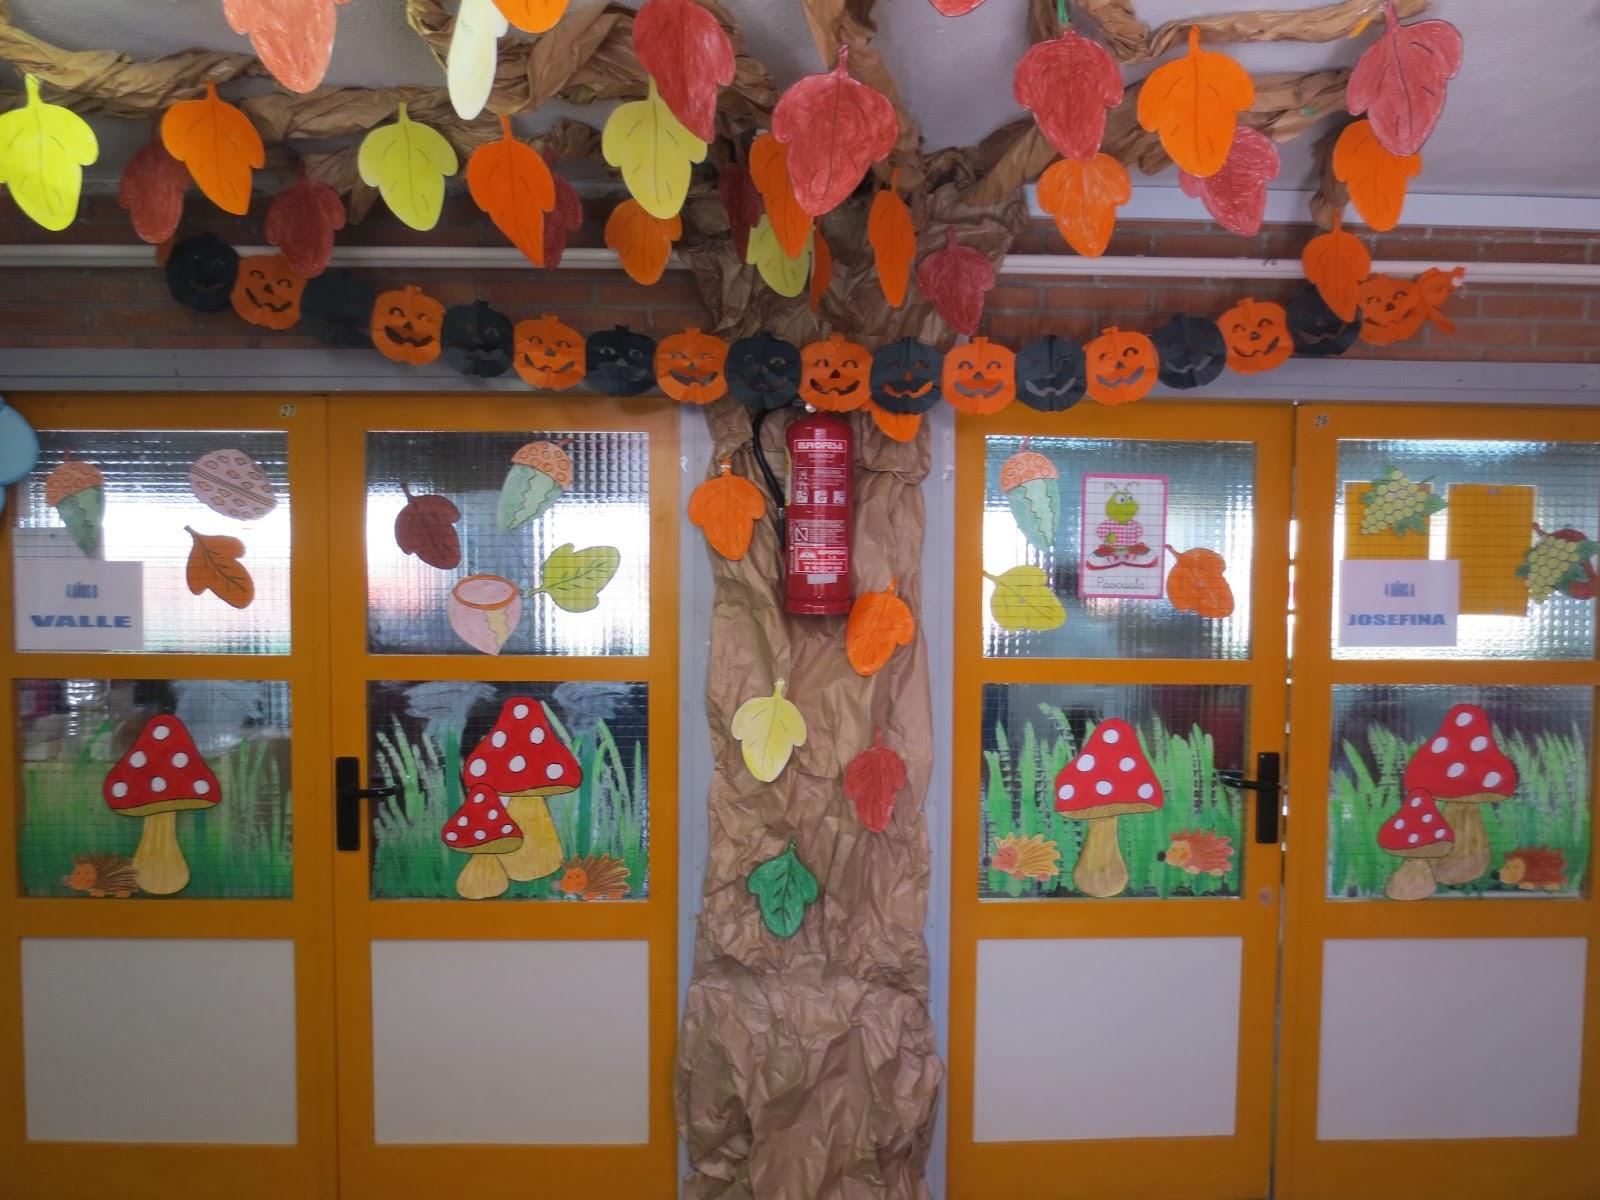 ceip maestra trinidad garc a decoraci n de oto o de infantil On decoracion otono infantil